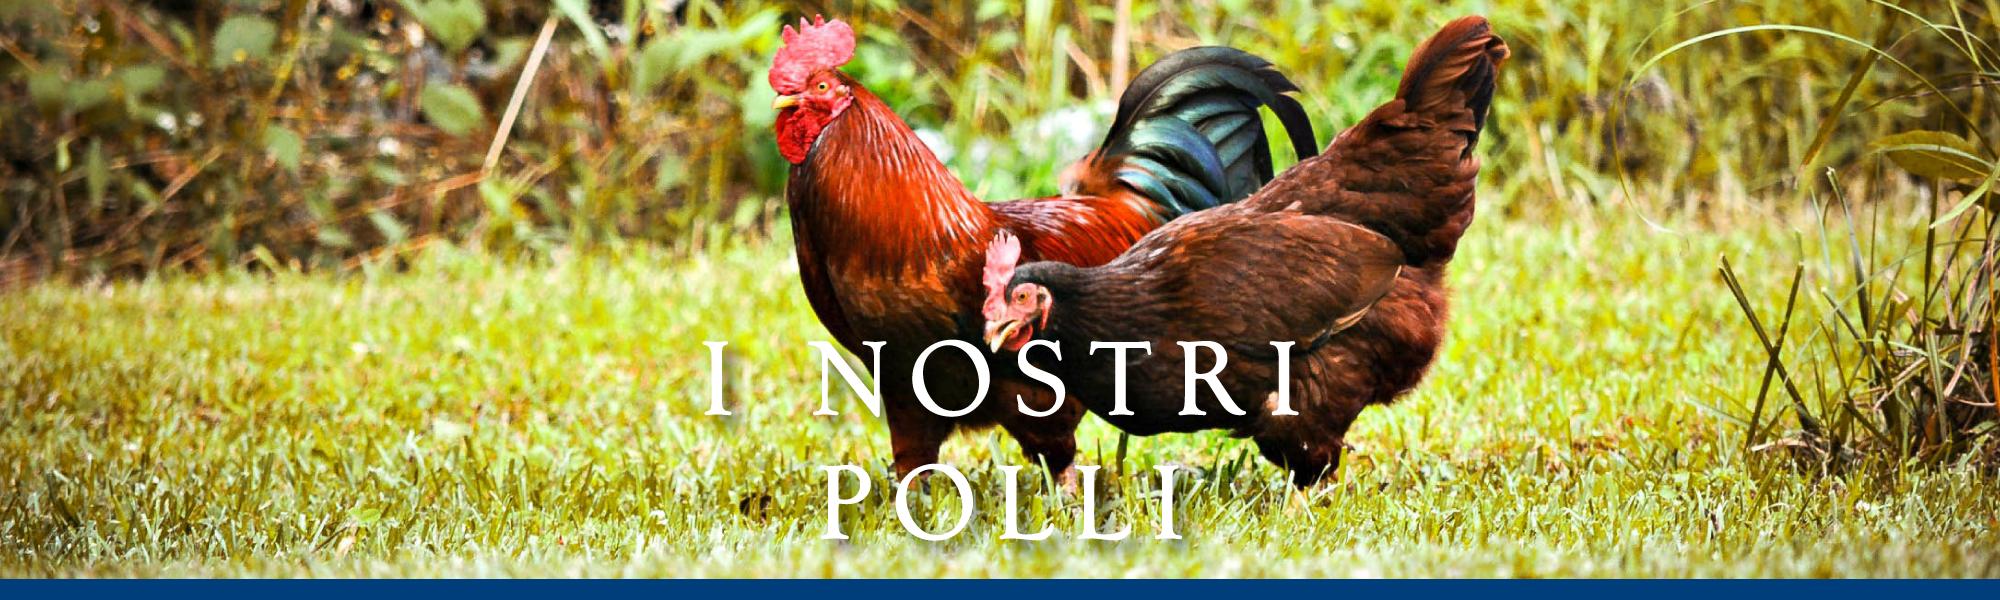 banner-i-nostri-polli